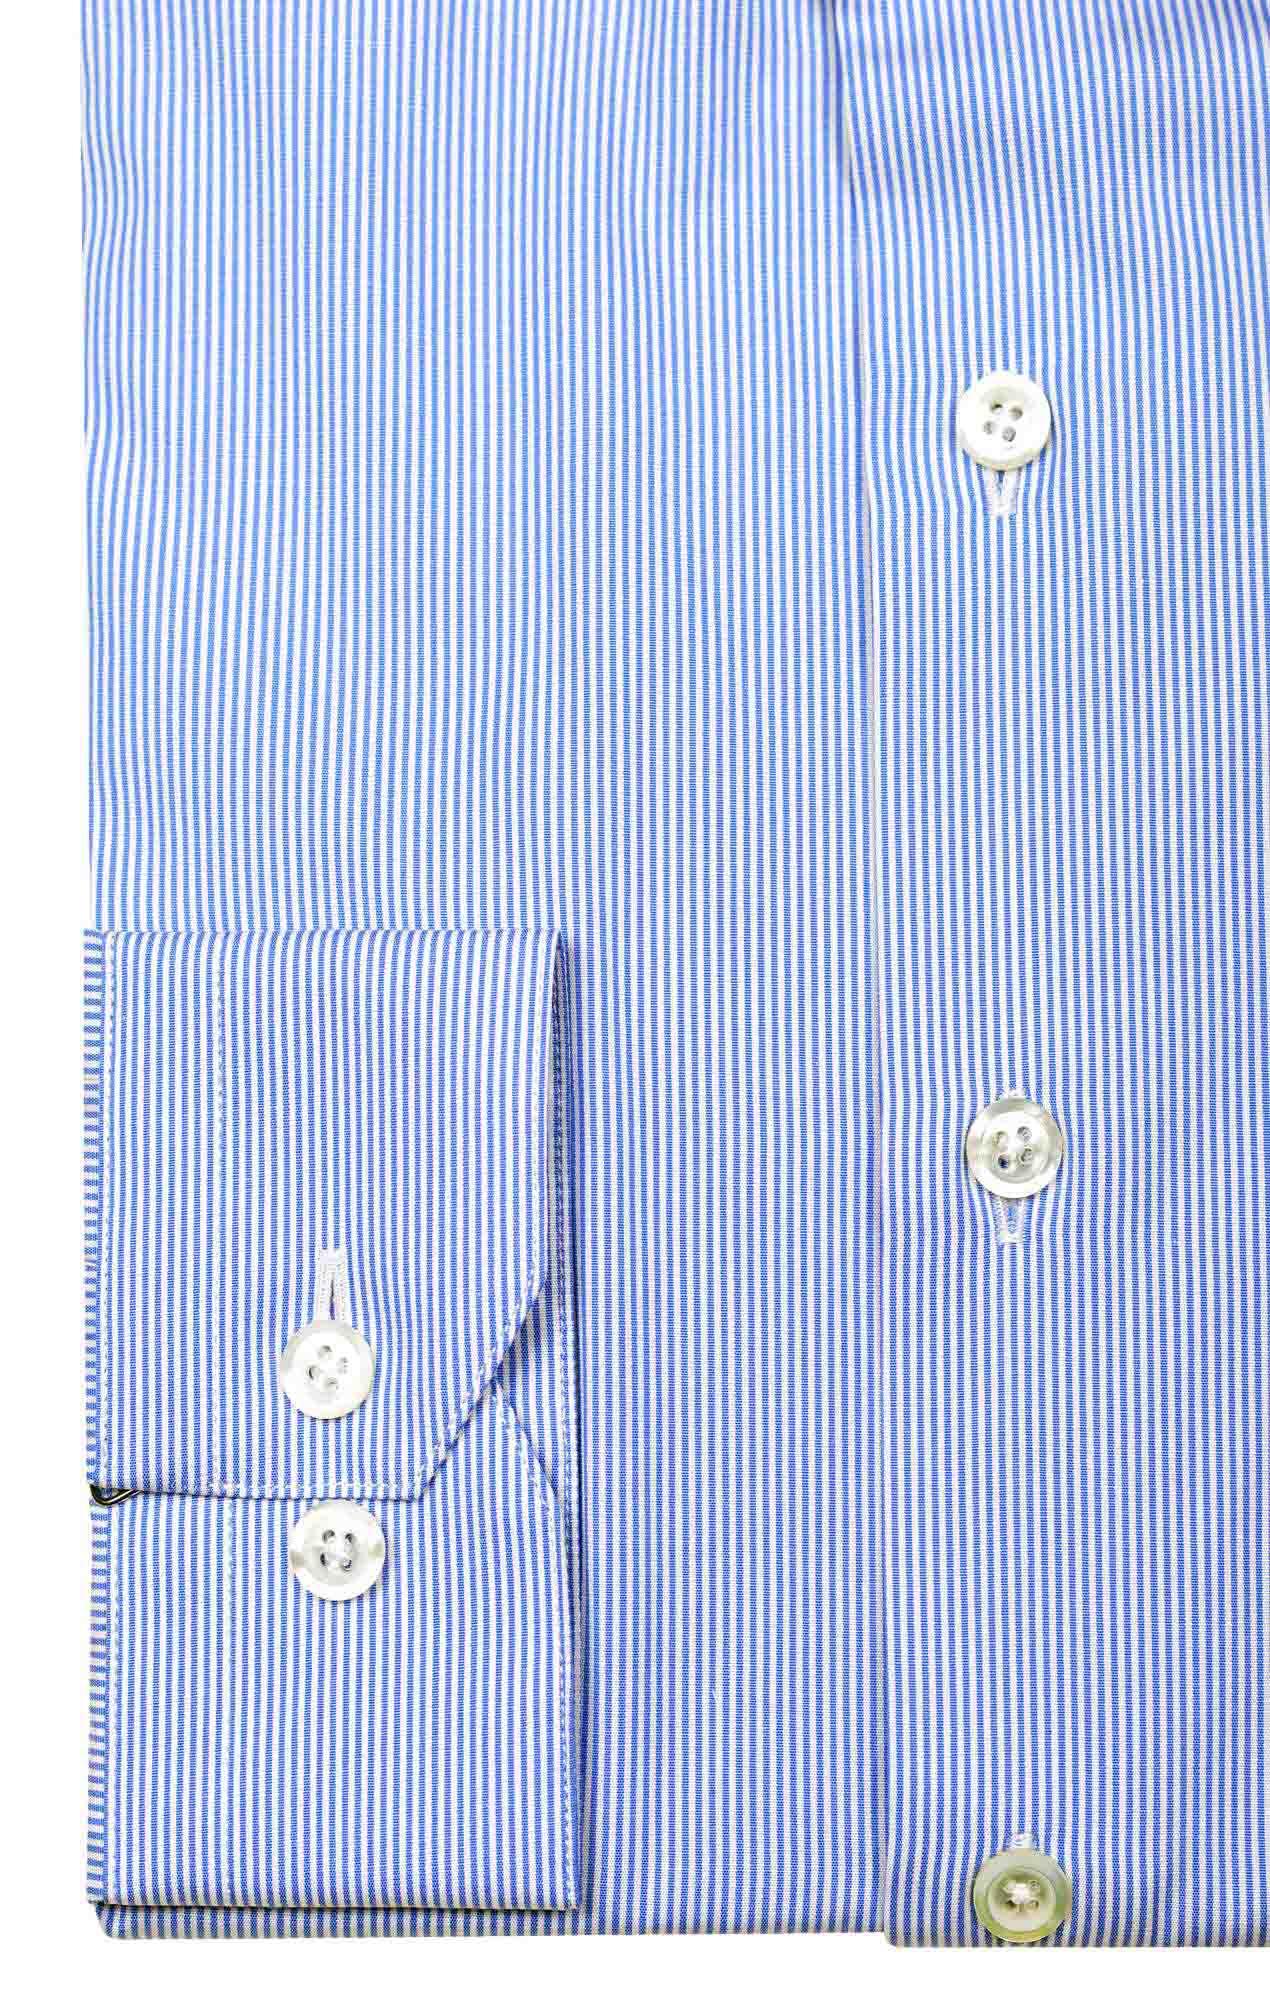 Chemise à rayures equidistantes Les chemises